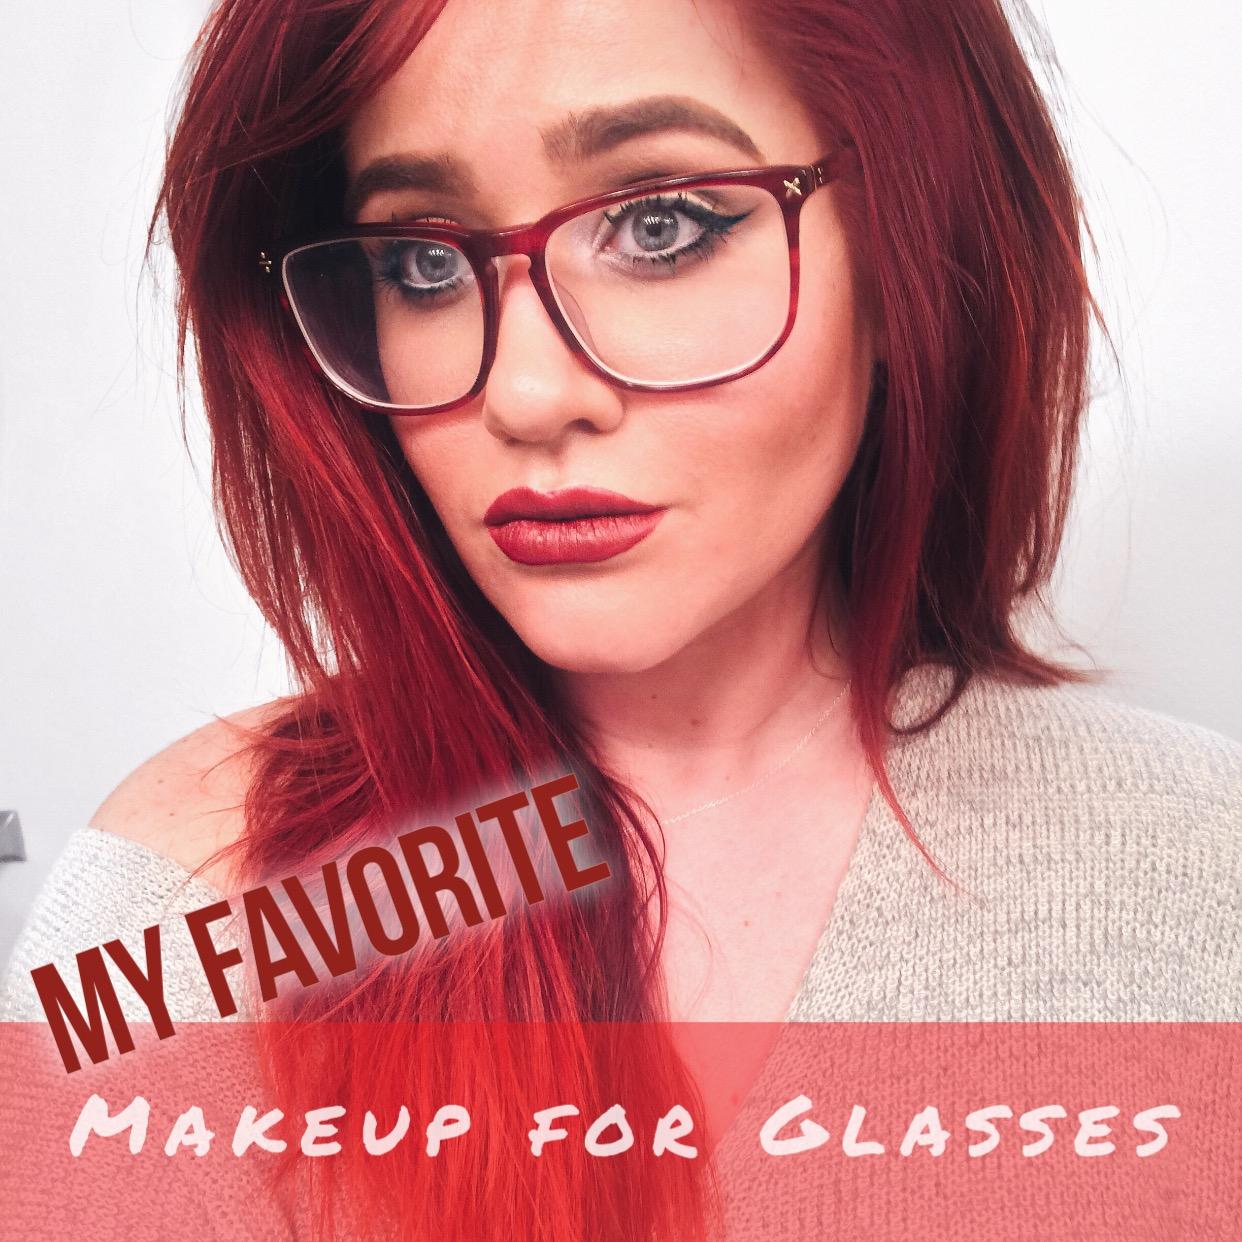 My Favorite Makeup for Glasses